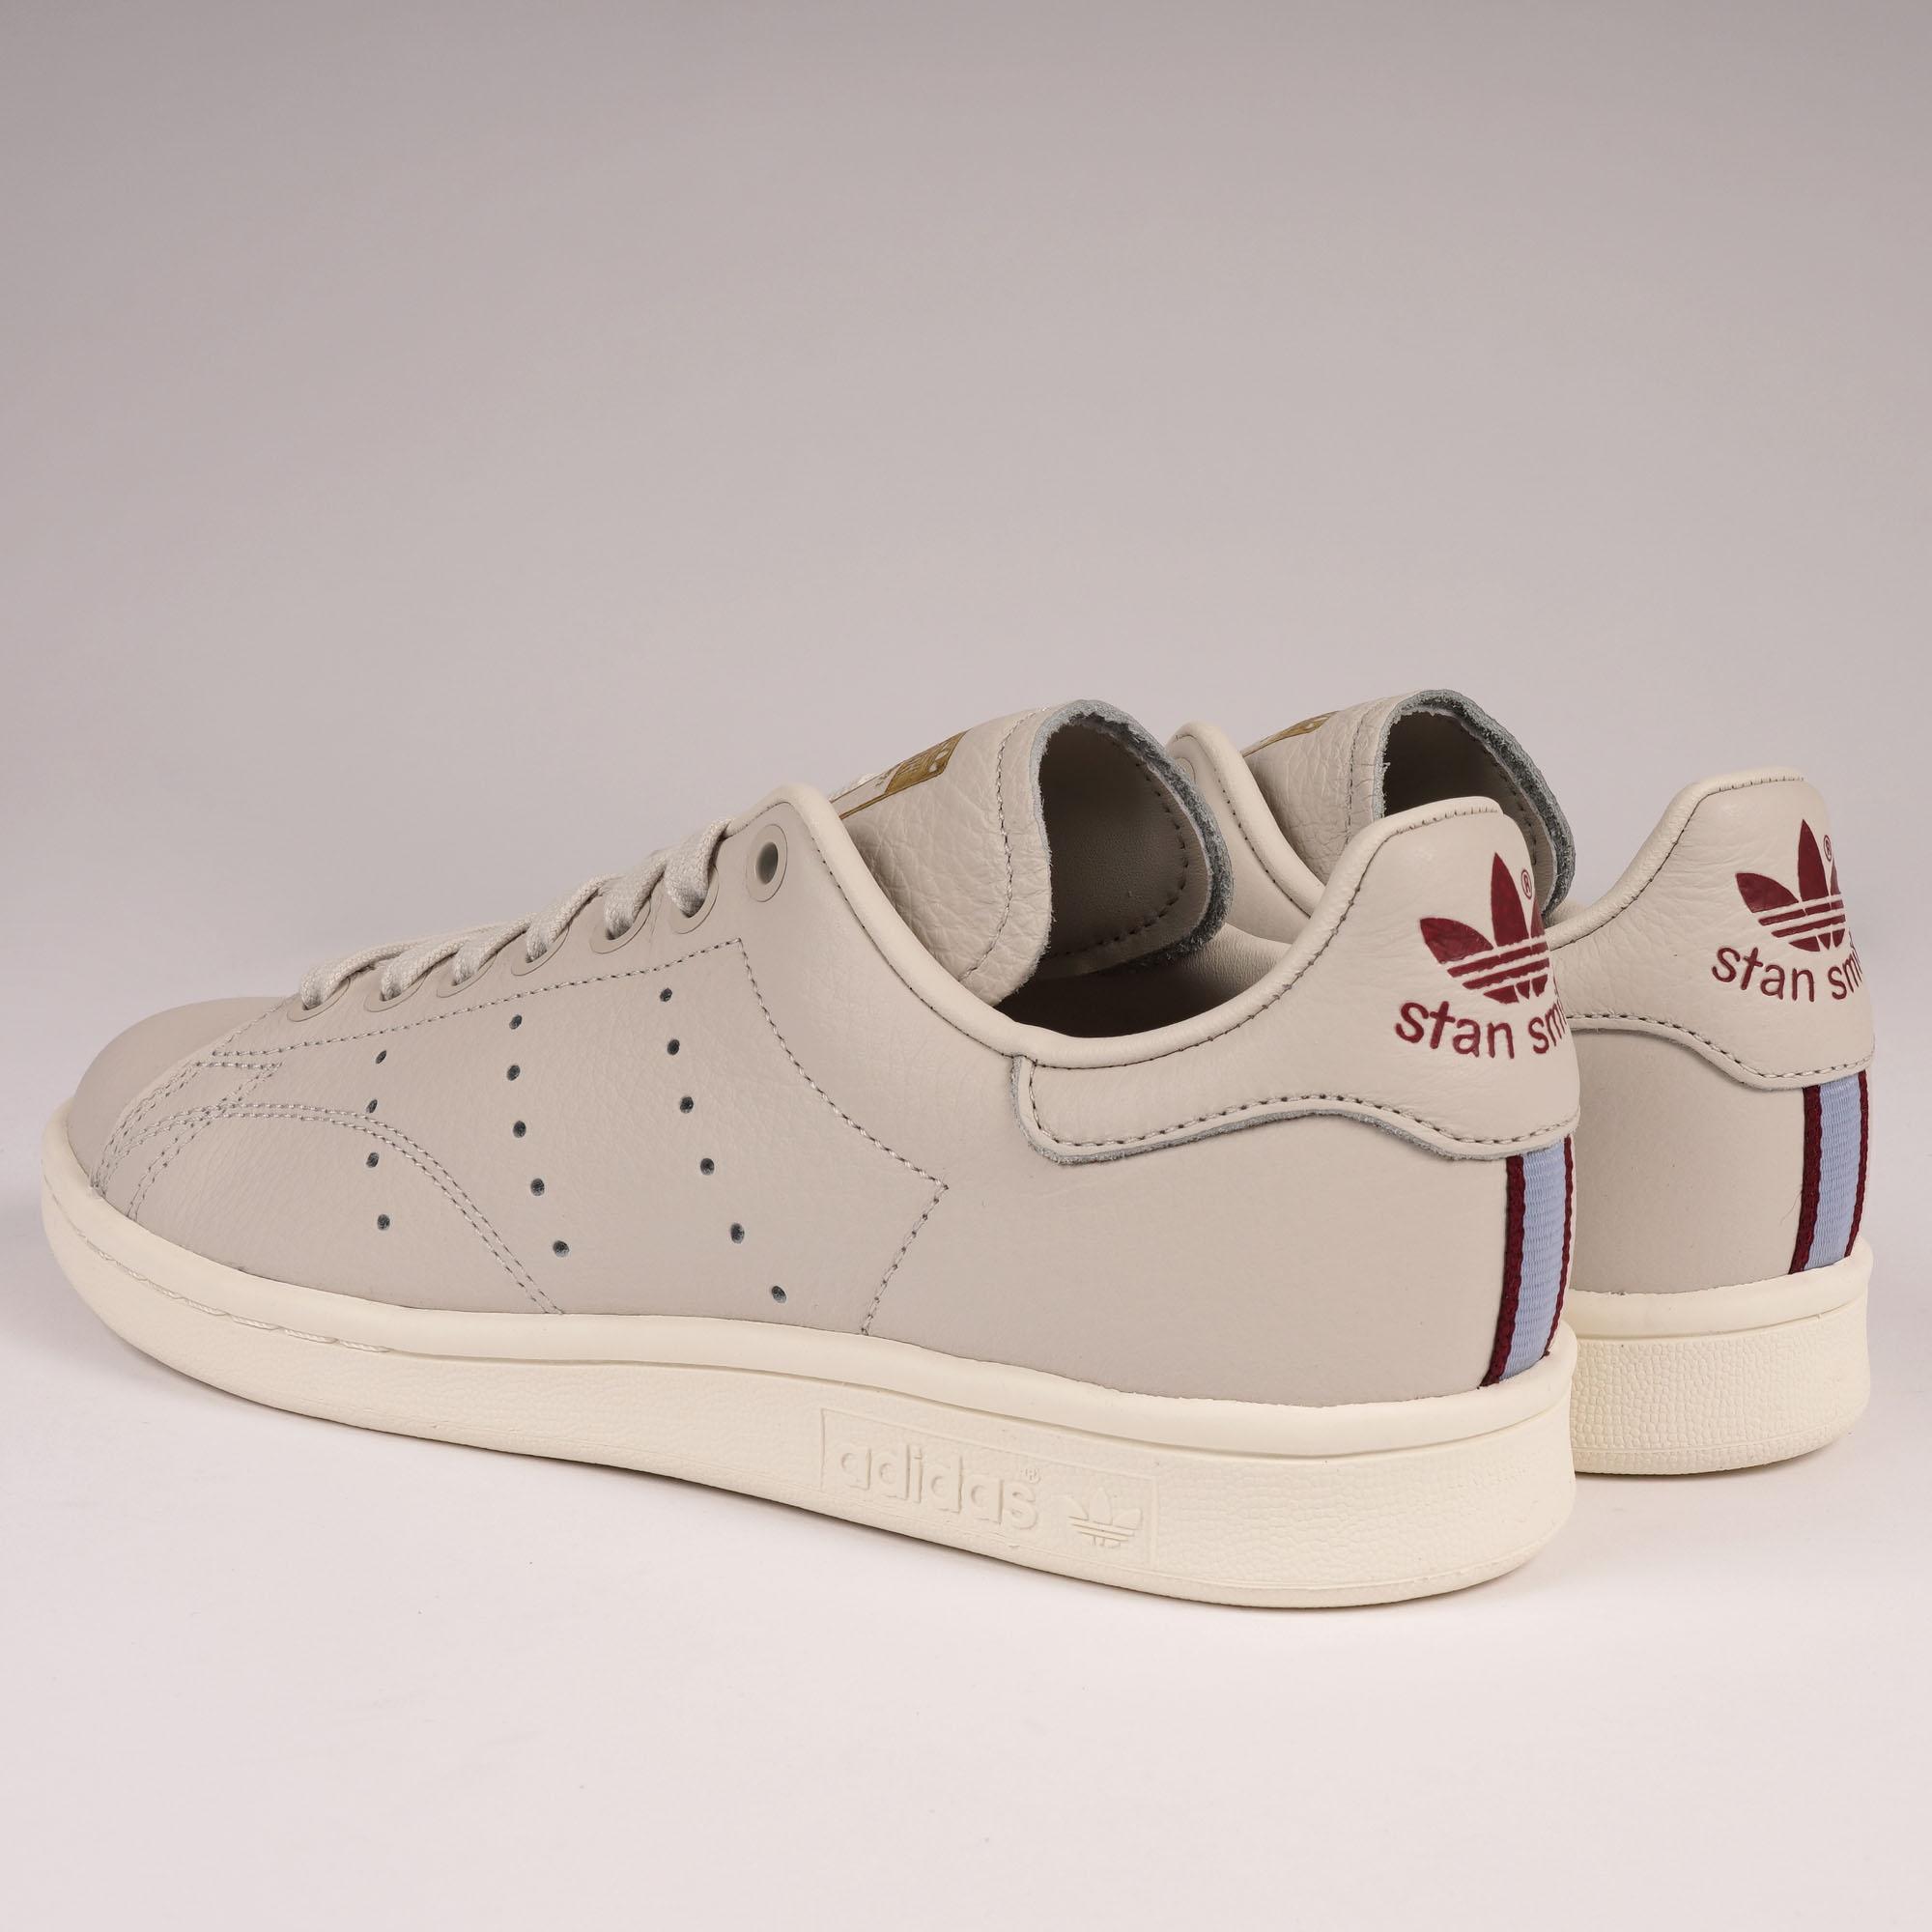 Lyst - adidas Originals Stan Smith - Raw White e6cf99418